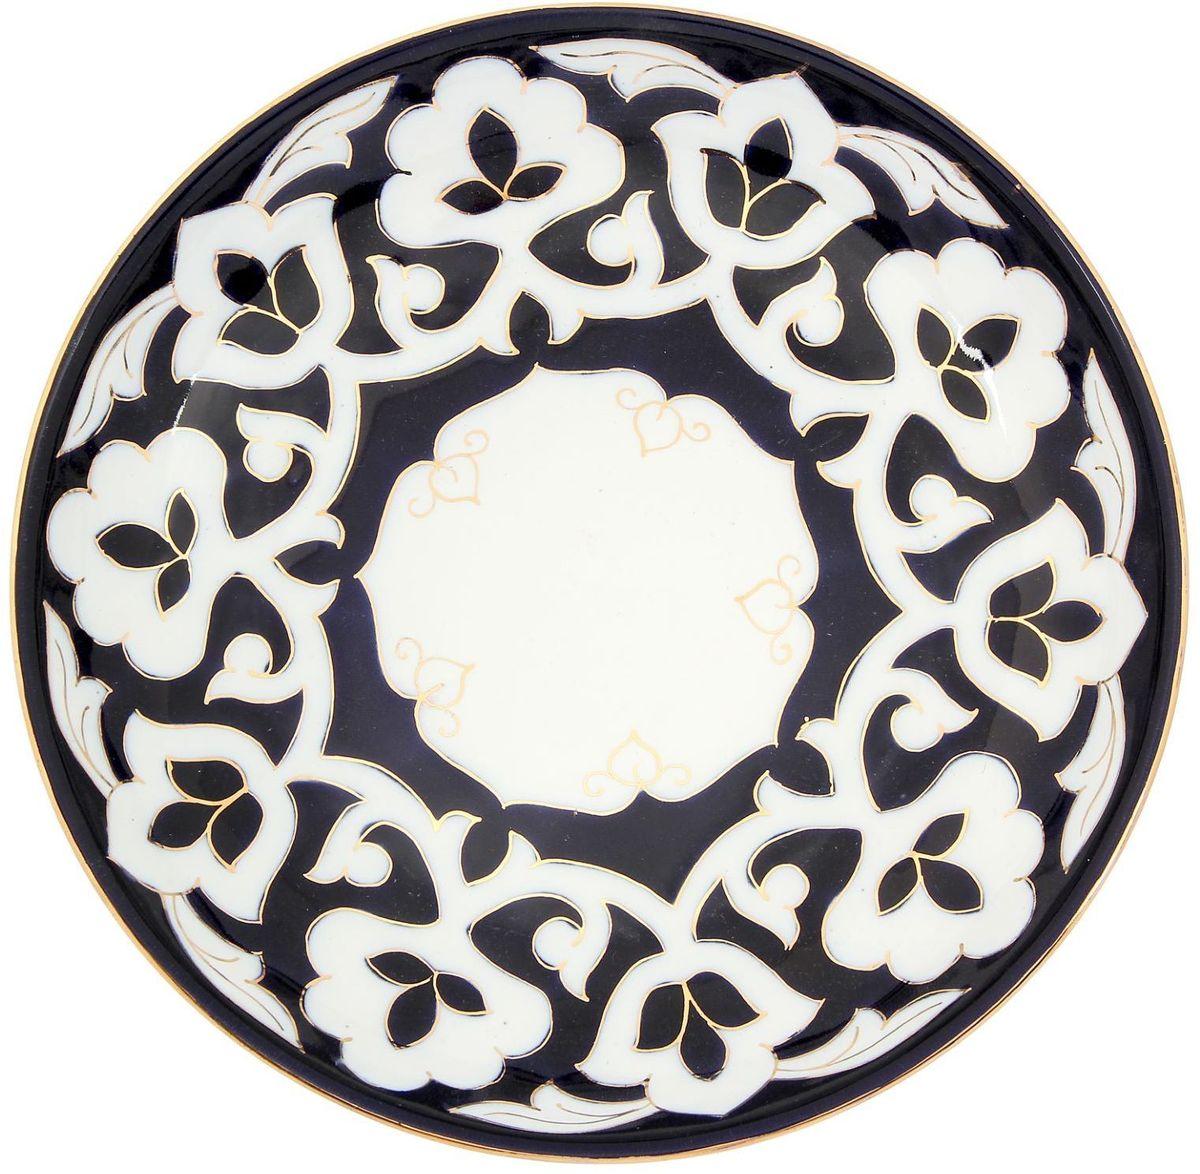 Фото - Ляган Turon Porcelain Пахта, цвет: темно-синий, белый, золотистый, диаметр 25 см тарелка turon porcelain атлас цвет белый синий золотистый диаметр 22 5 см